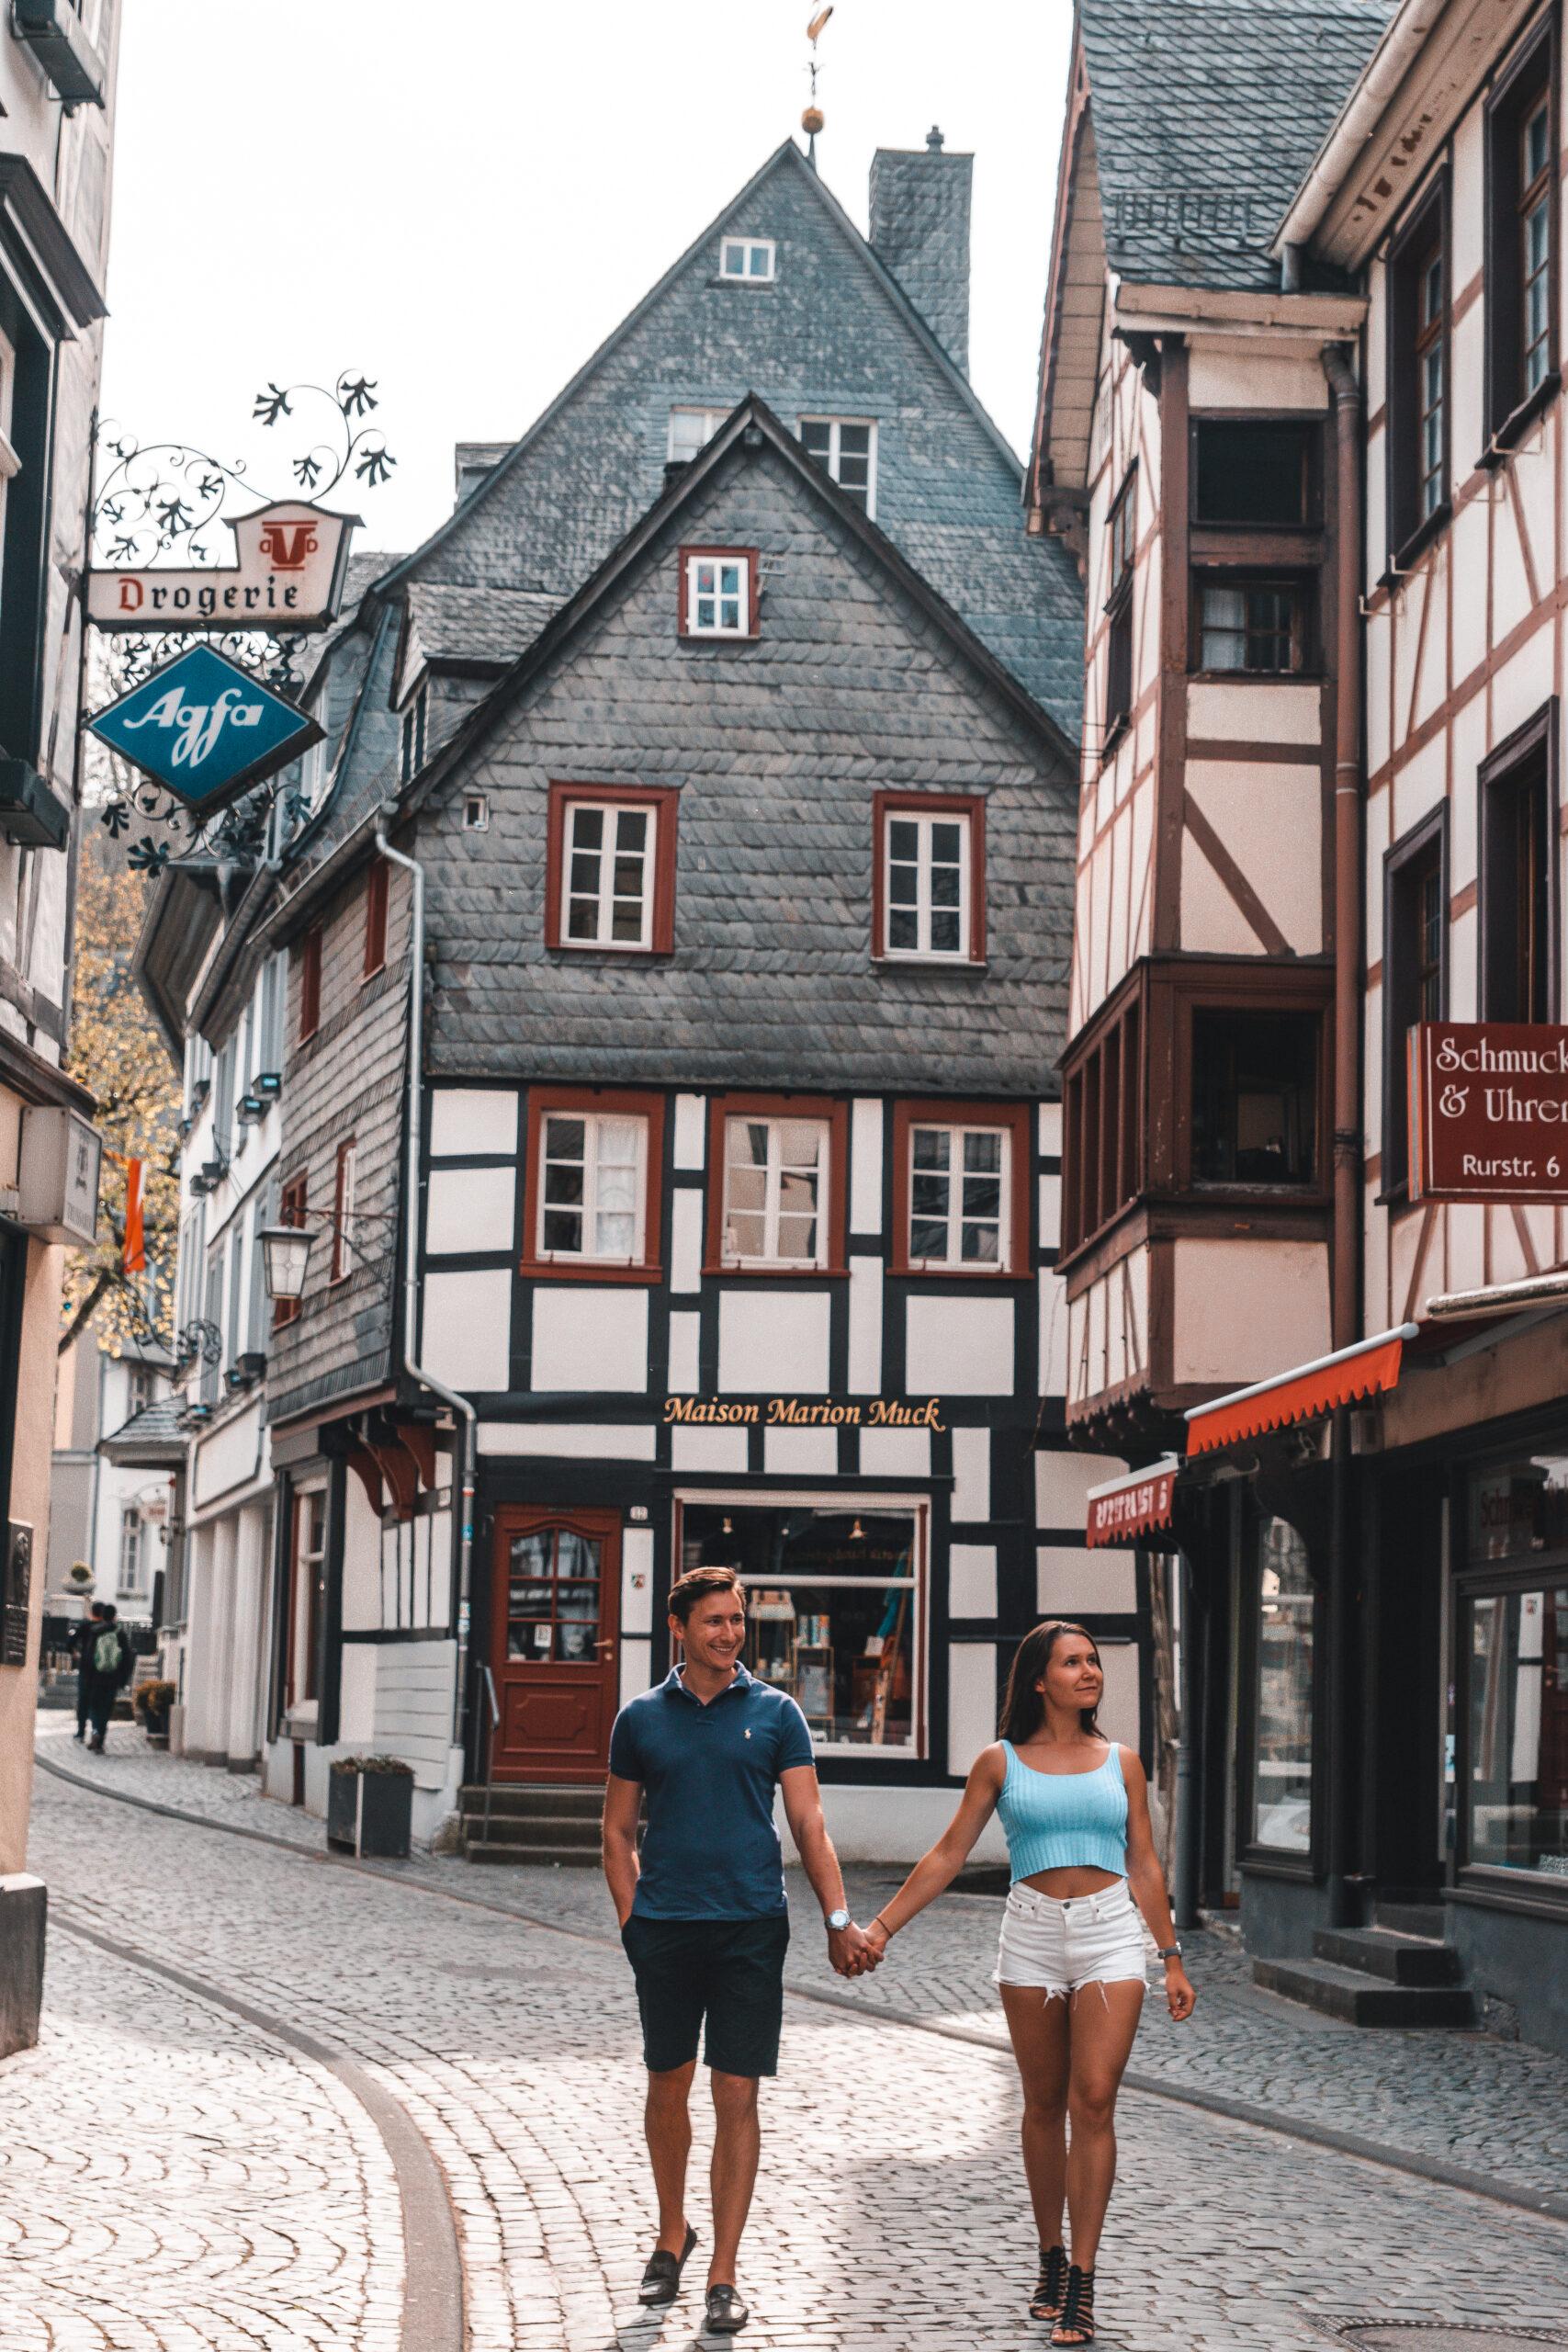 Monschau Travel Guide |Monschau as a day trip from Cologne